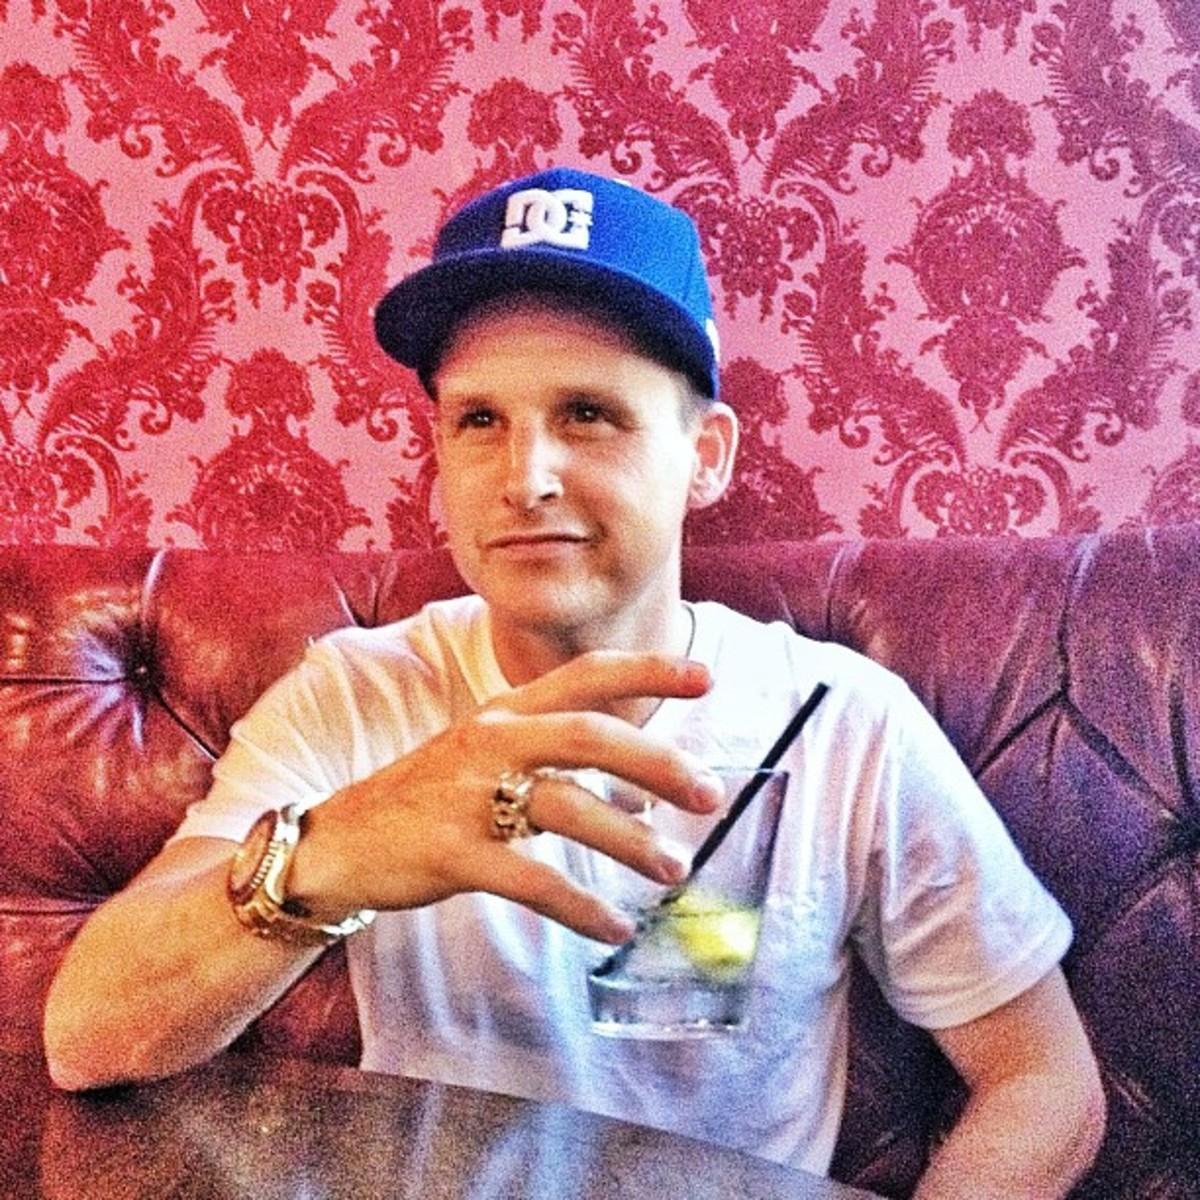 Professional Skatetrepreneur, Rob Dyrdek